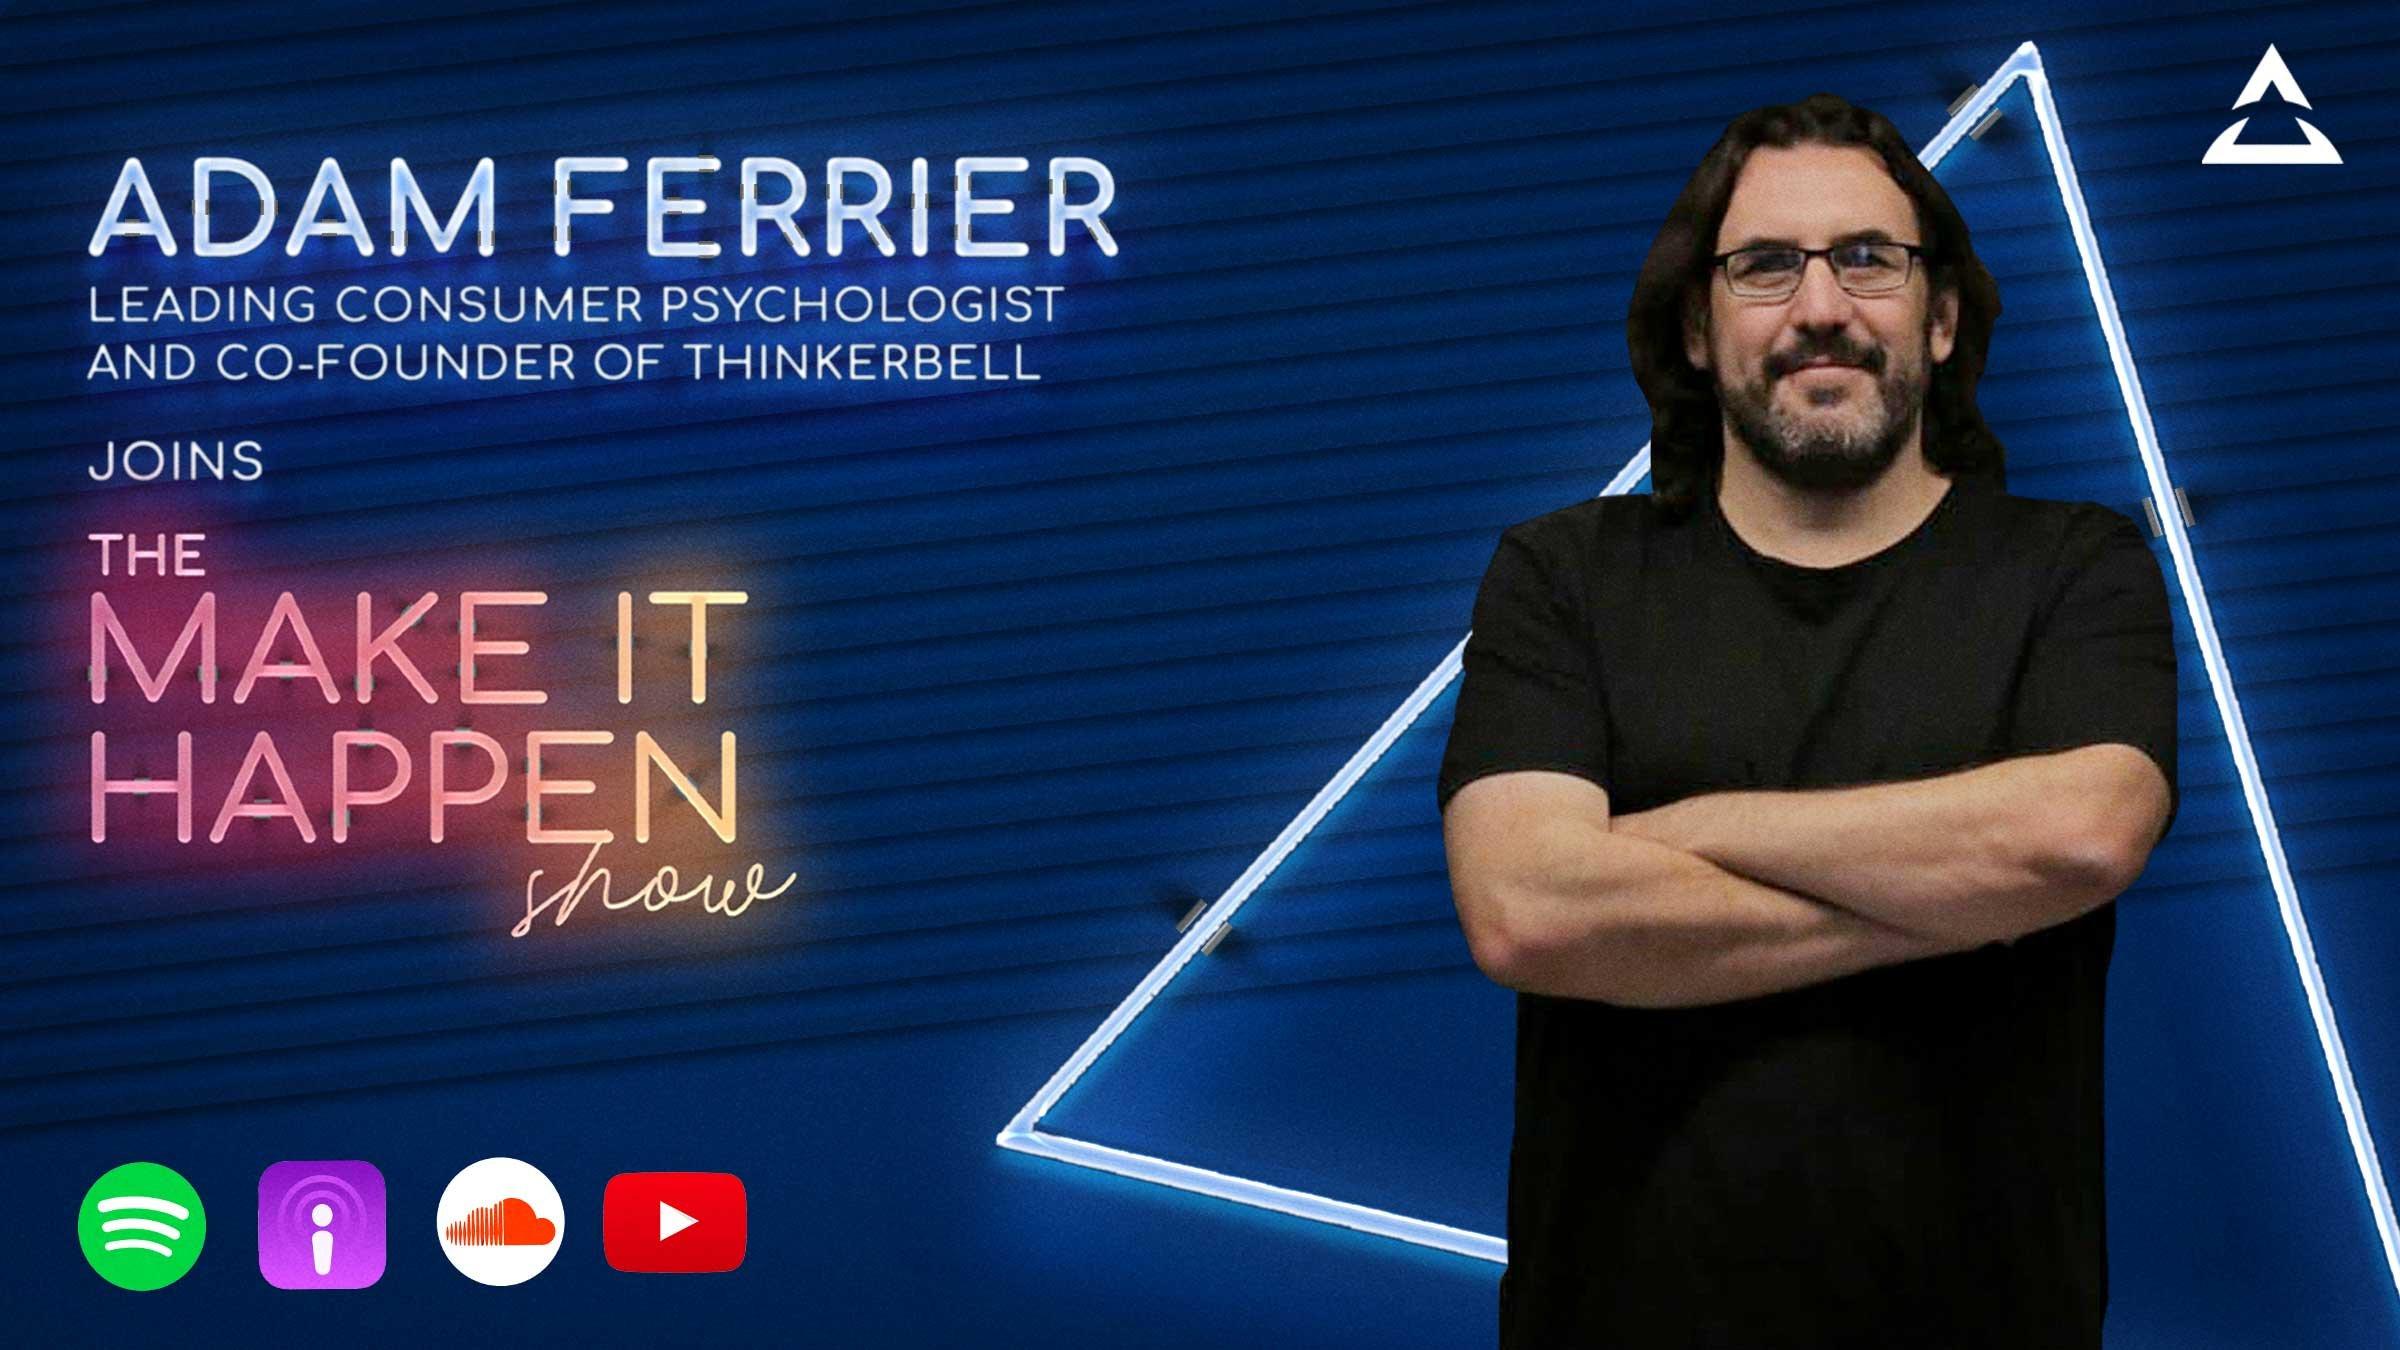 Adam Ferrier joins The Make It Happen Show promotional image